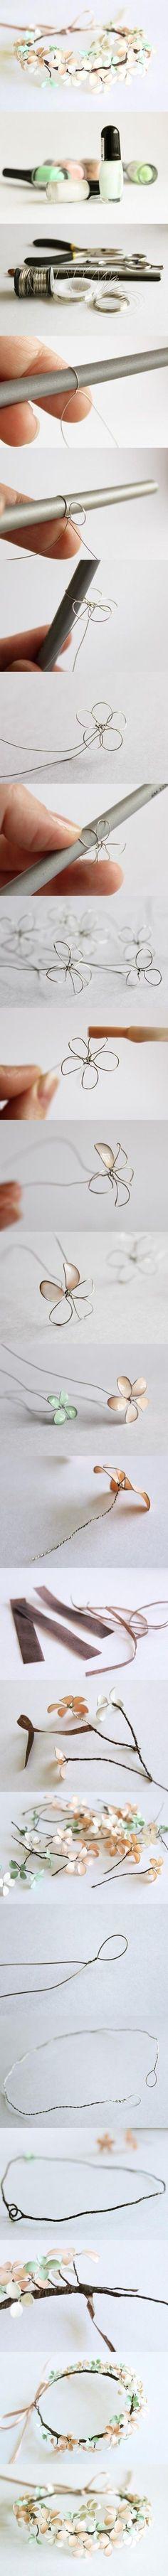 11 Coronas de flores que puedes hacer tú misma sin lucir como un florero